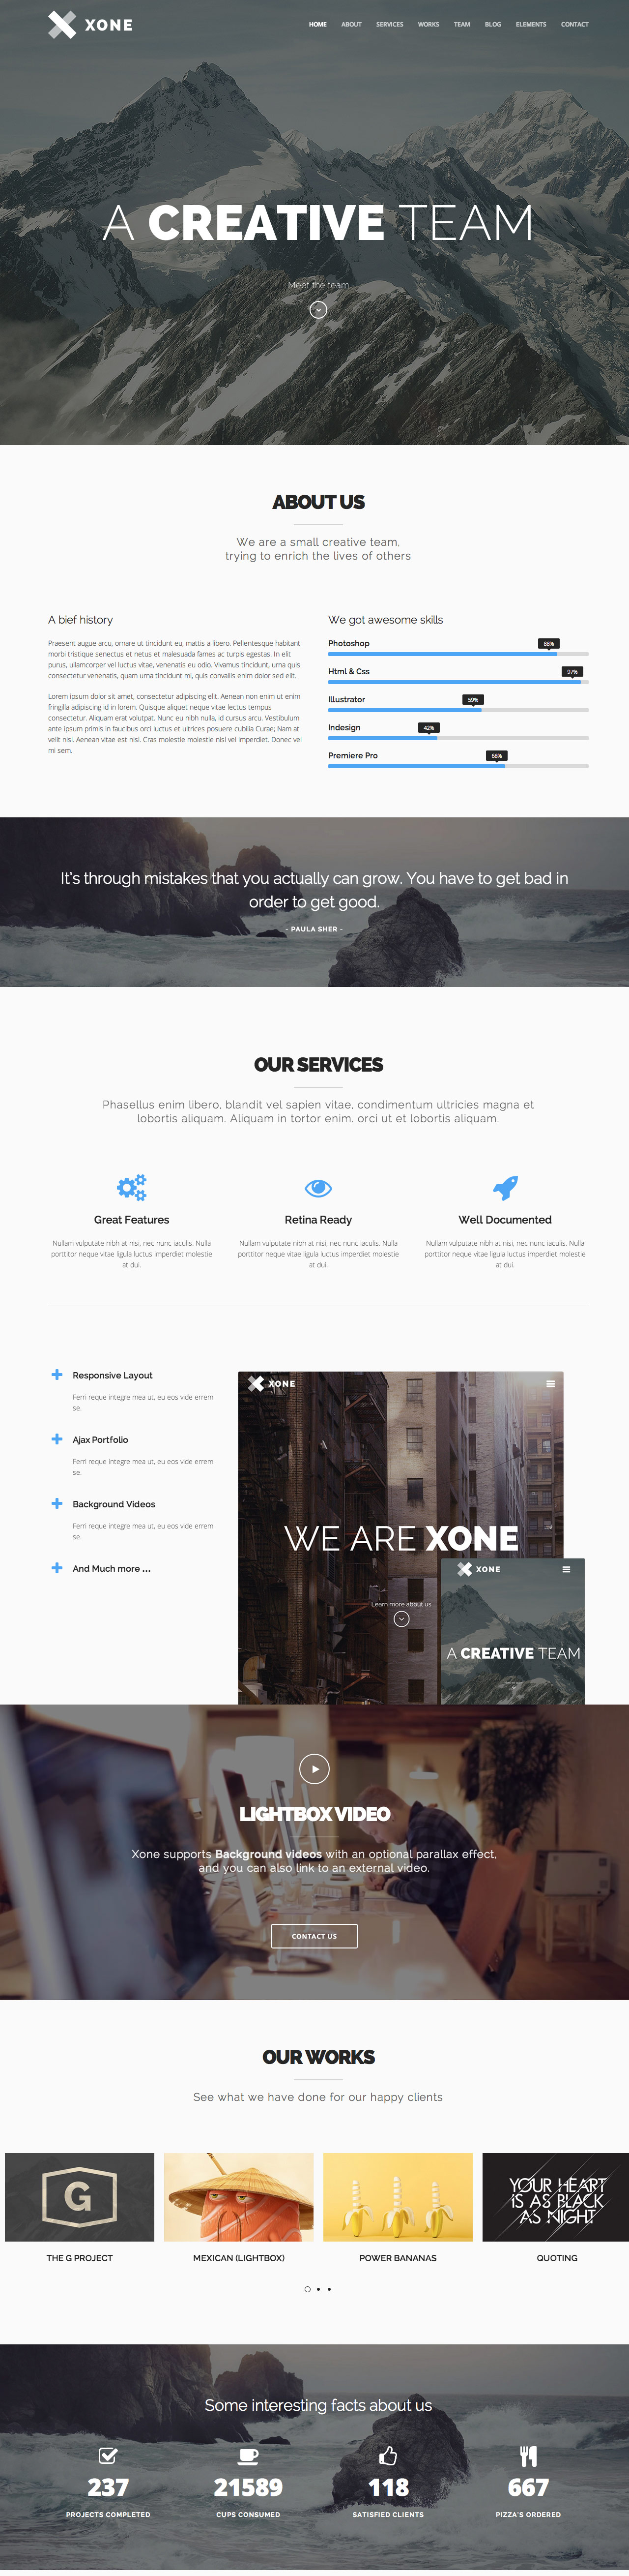 Xone Website Screenshot